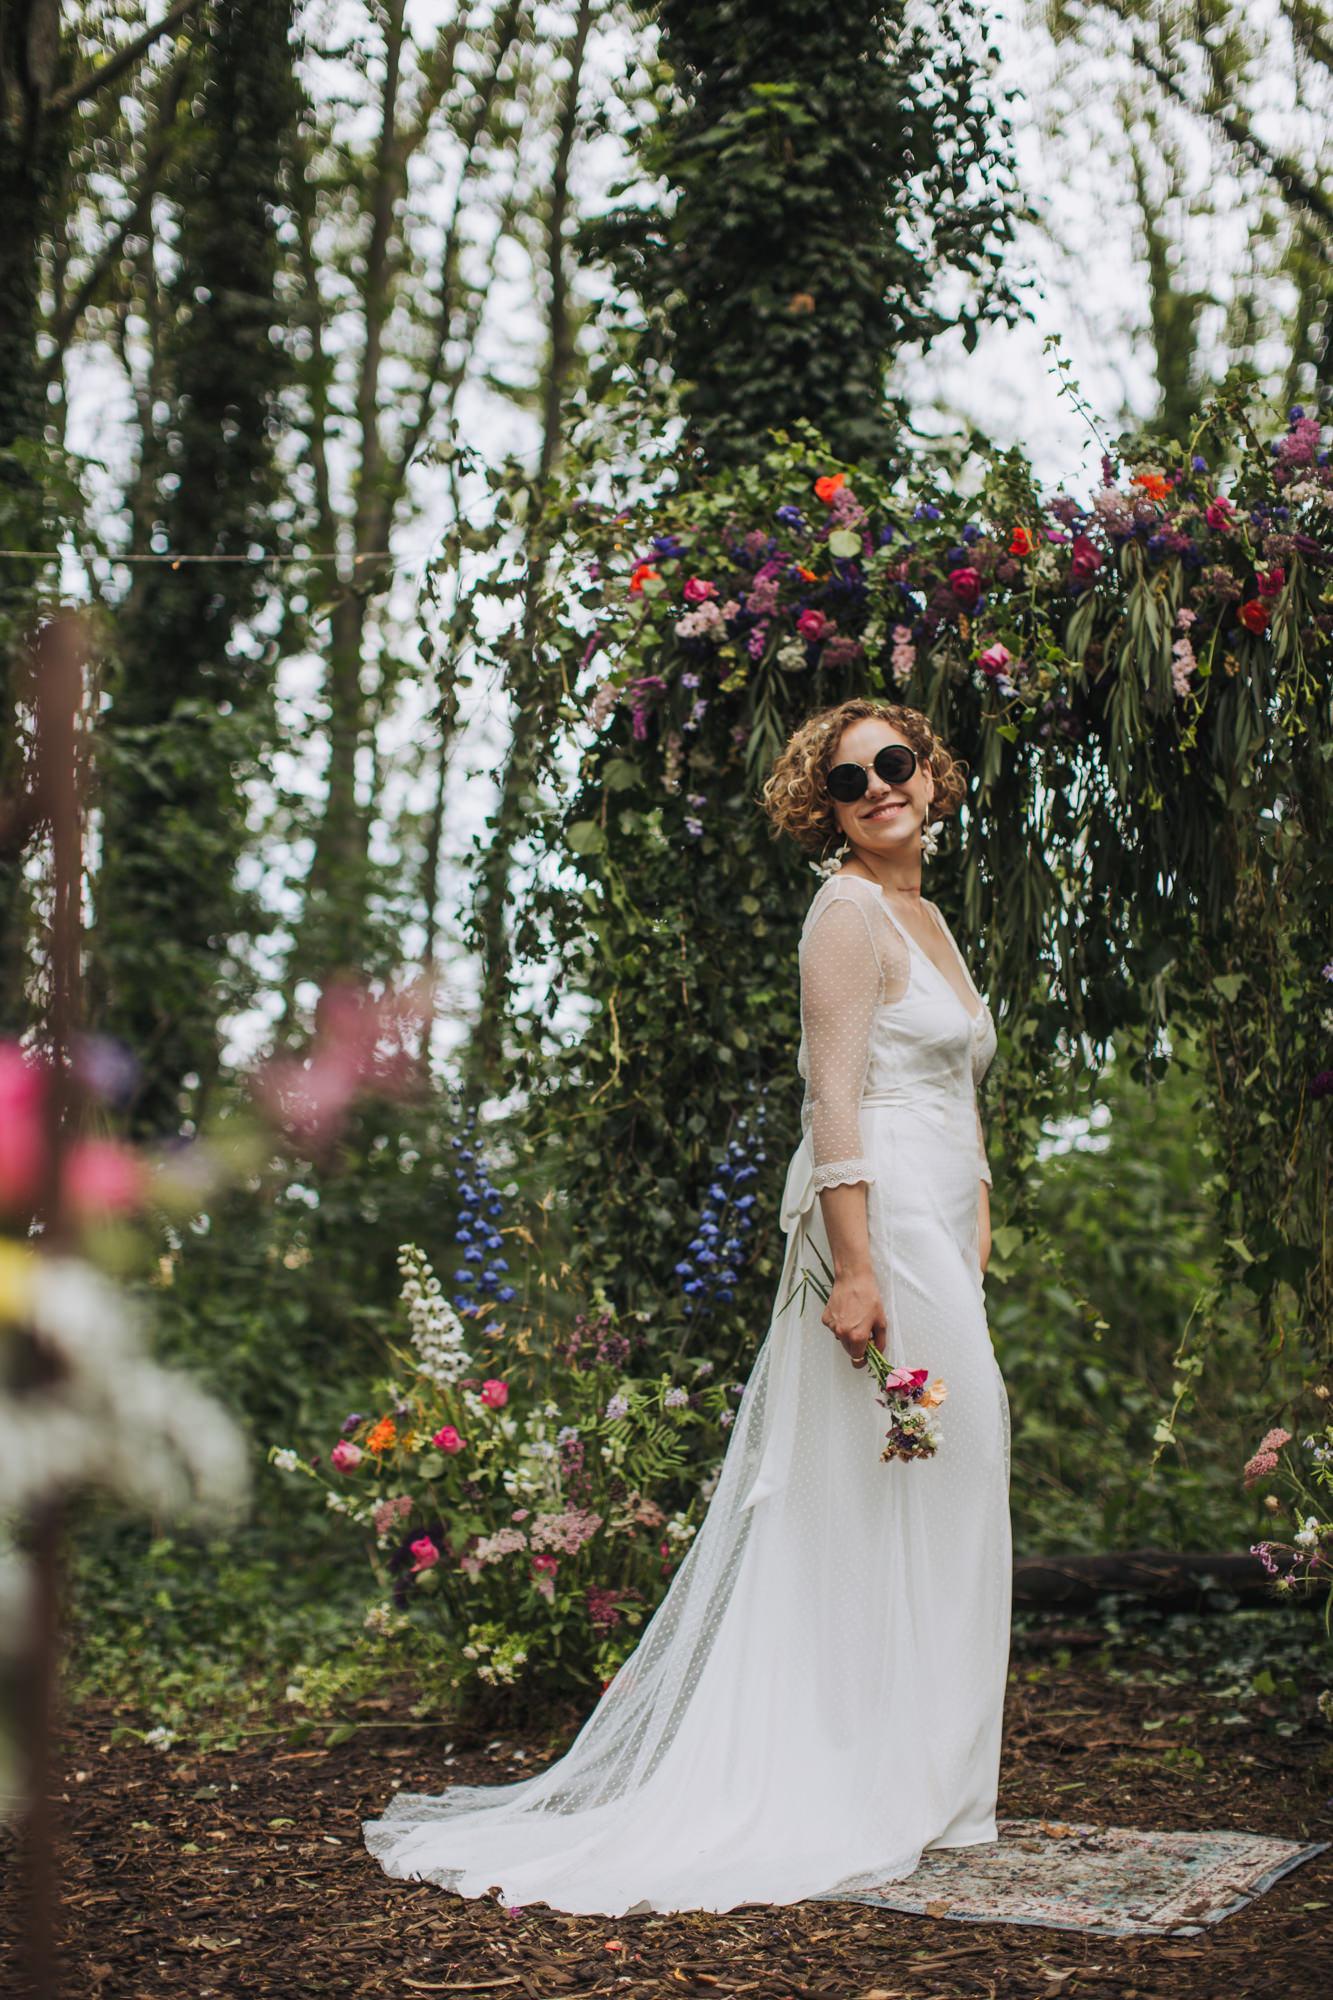 applewood wedding photographer leeds, yorkshire49.jpg